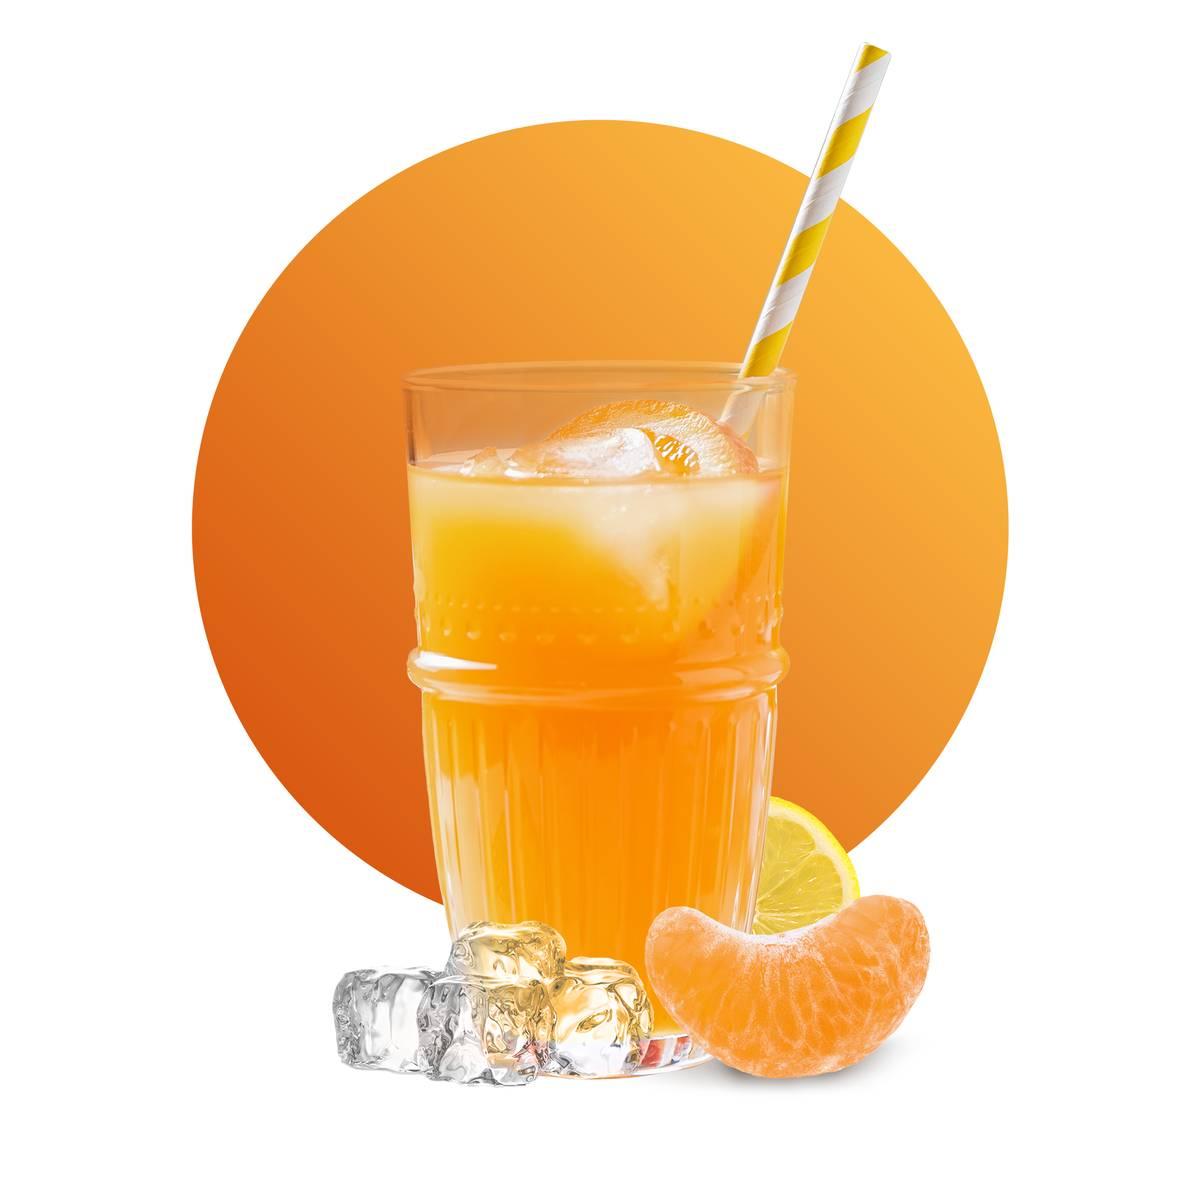 Tangerine Lemonade Drink Recipe